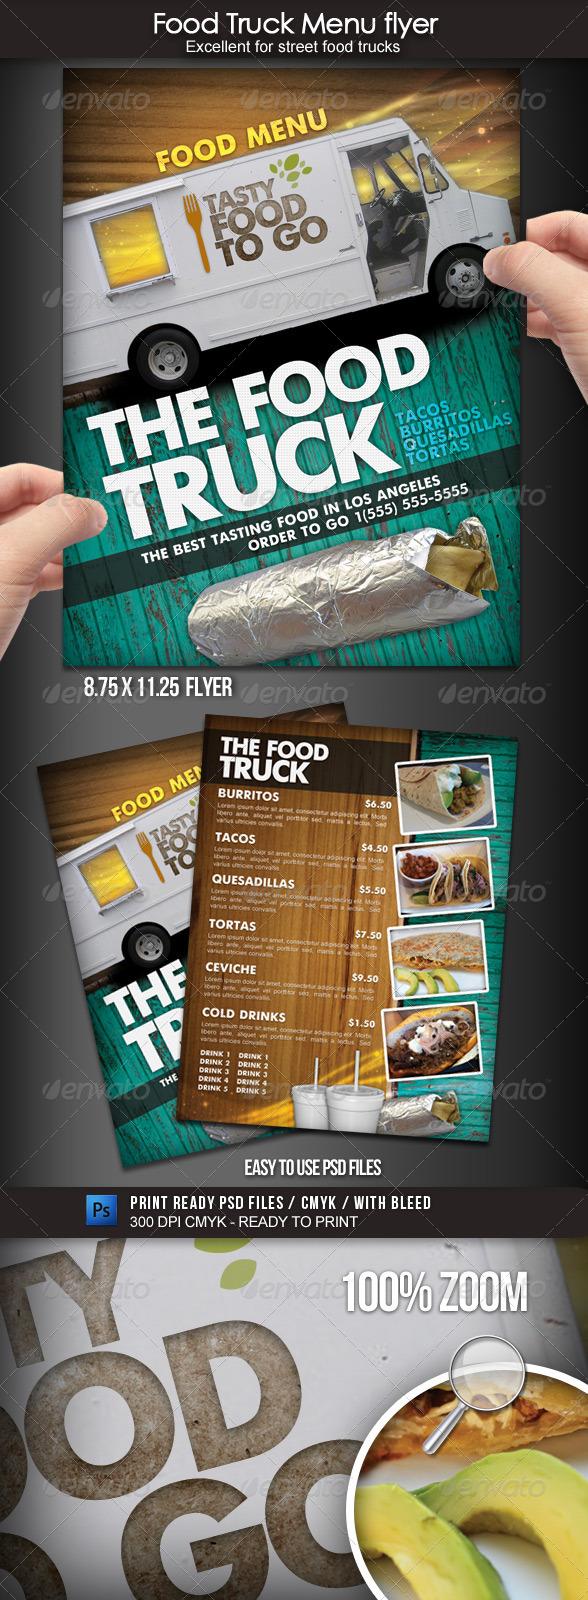 Food truck menu flyer graphicriver for Food truck menu design